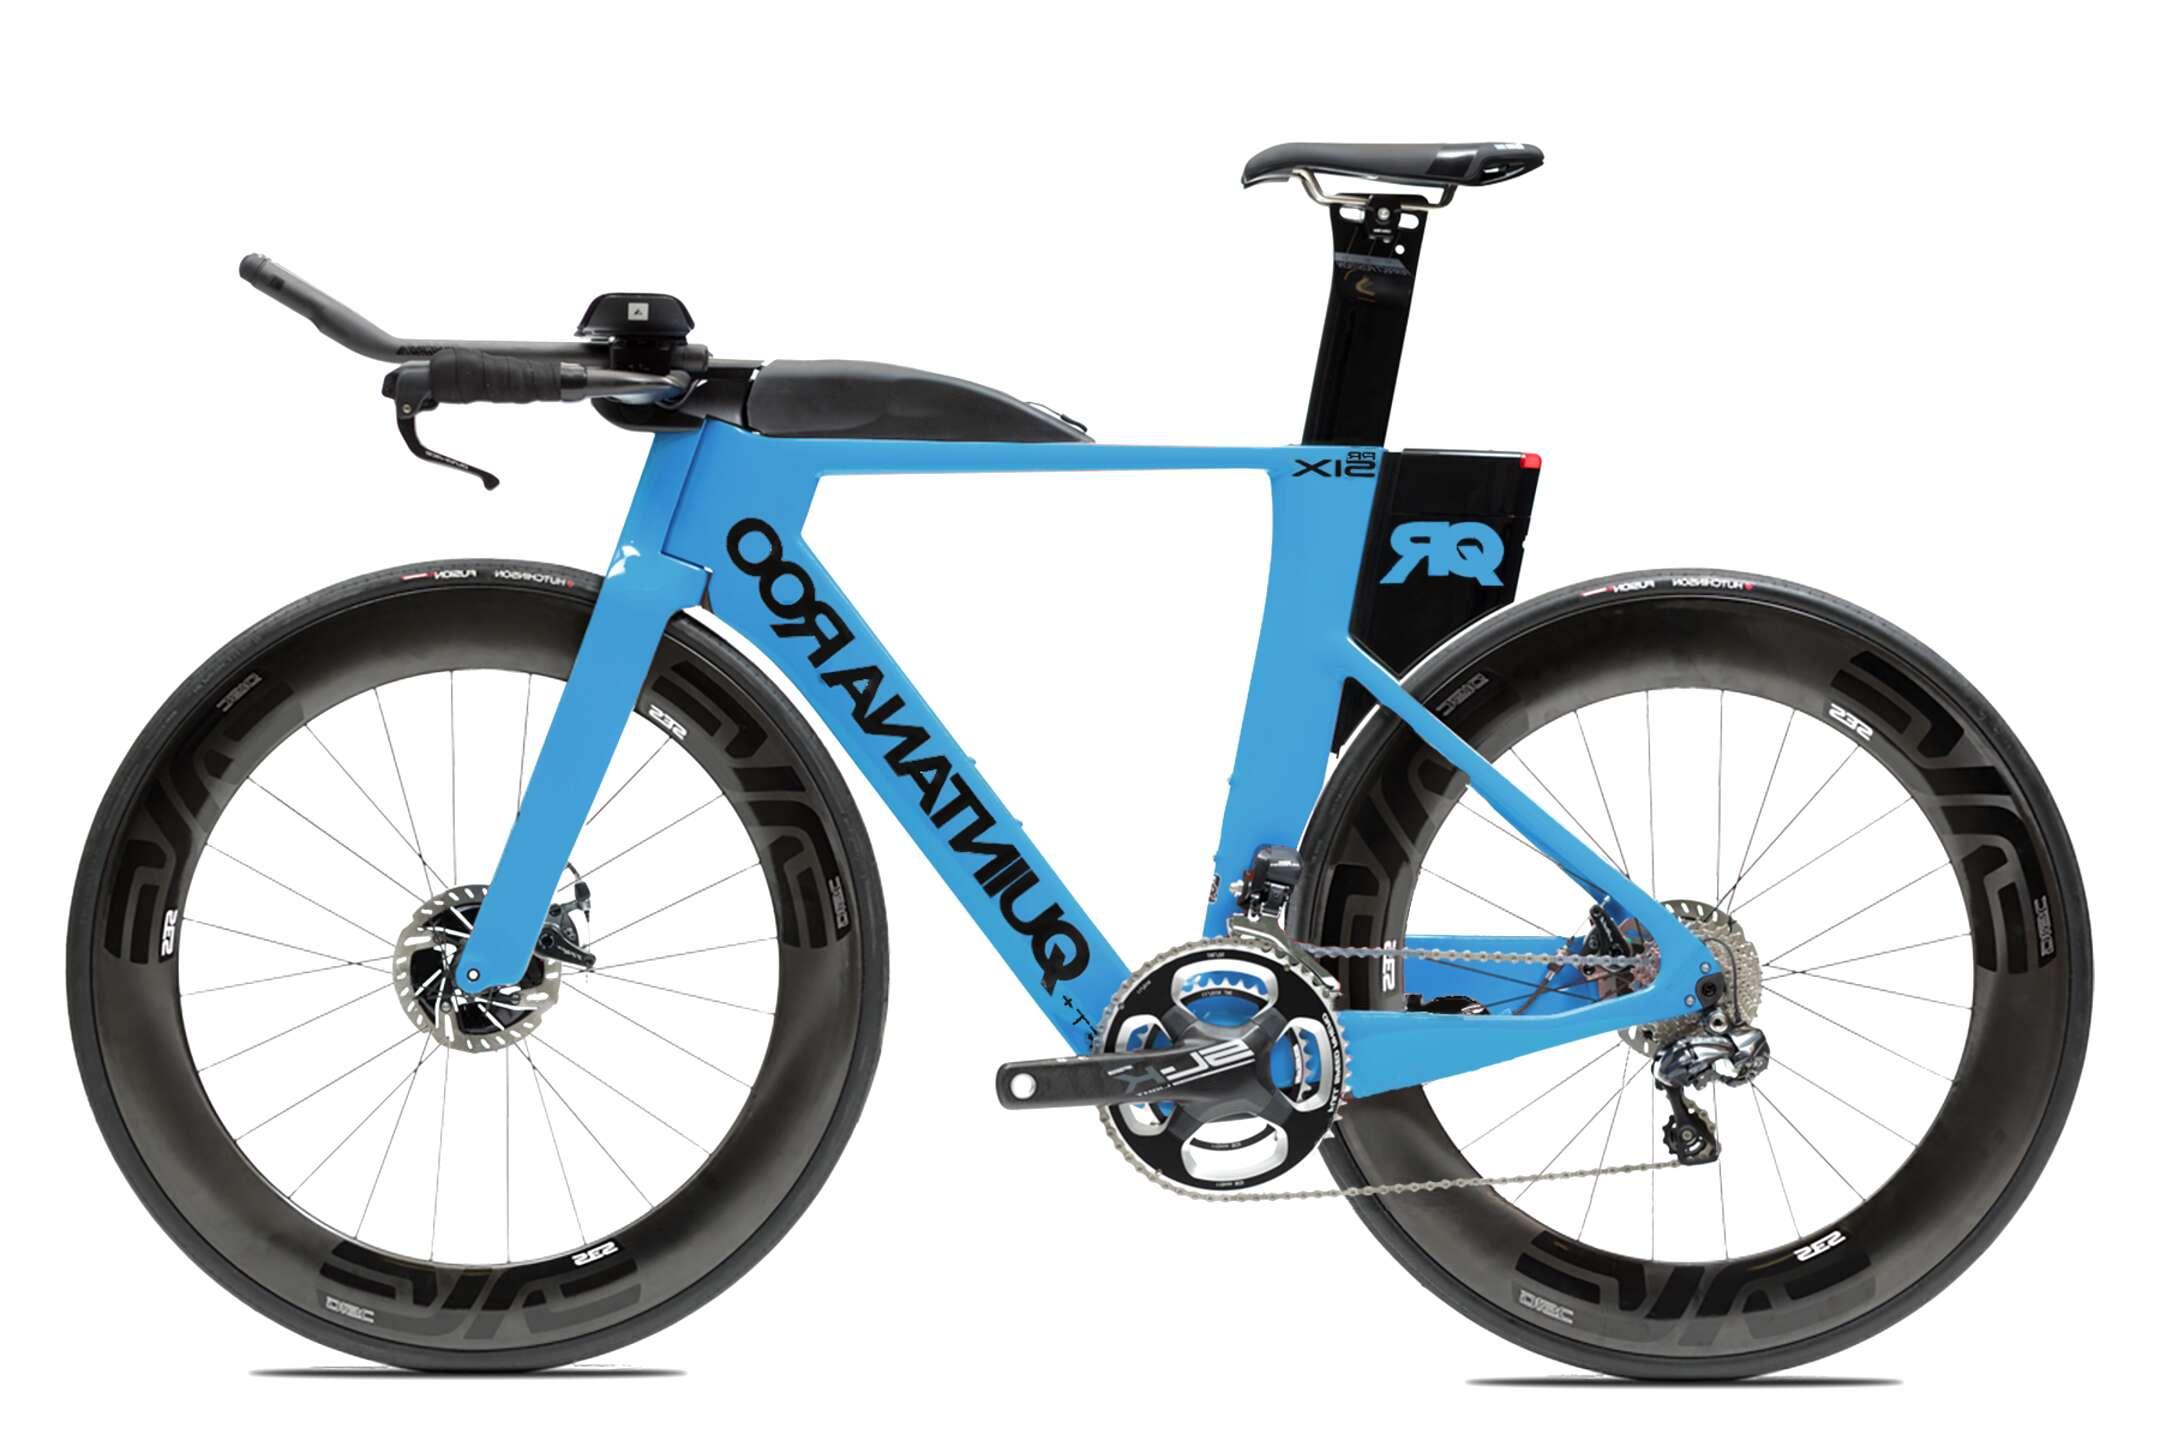 quintana roo bikes for sale